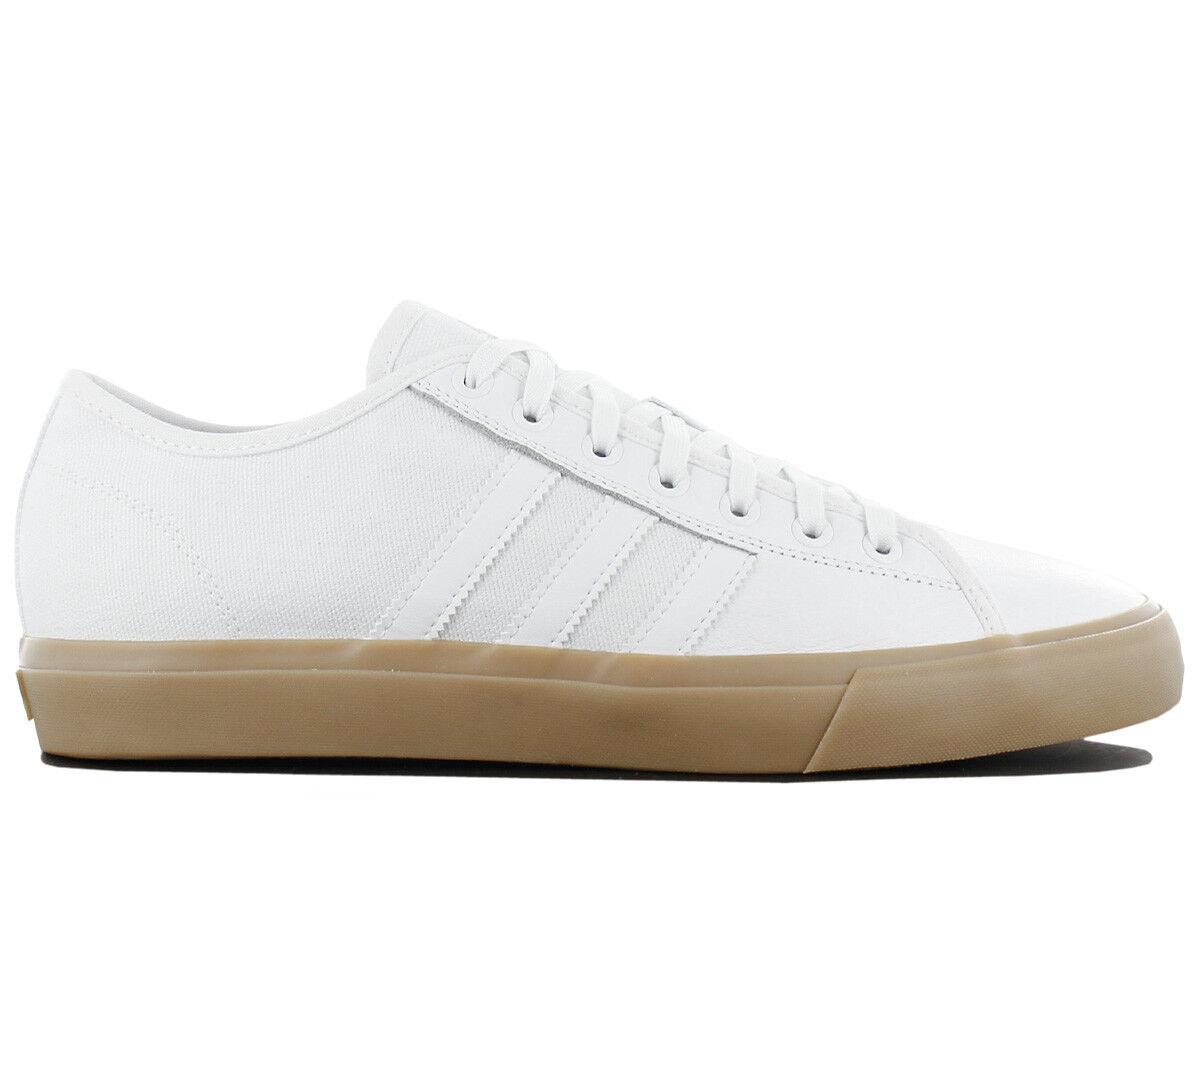 adidas Originals Matchcourt RX Herren Turnschuhe Schuhe Turnschuhe Weiß BY3986 NEU